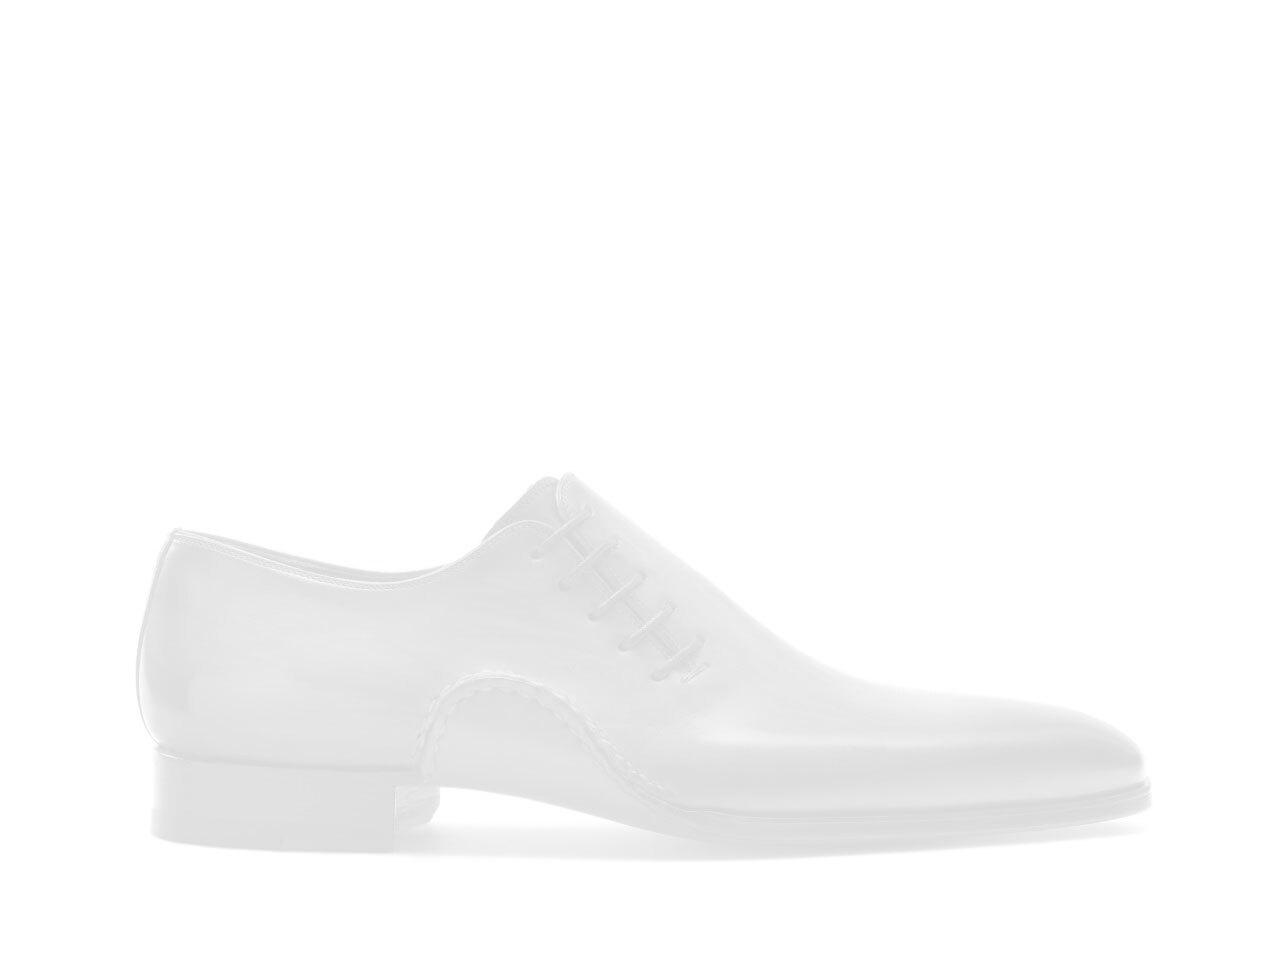 Side view of the Magnanni Bernina Castoro Men's Double Monk Strap Shoes